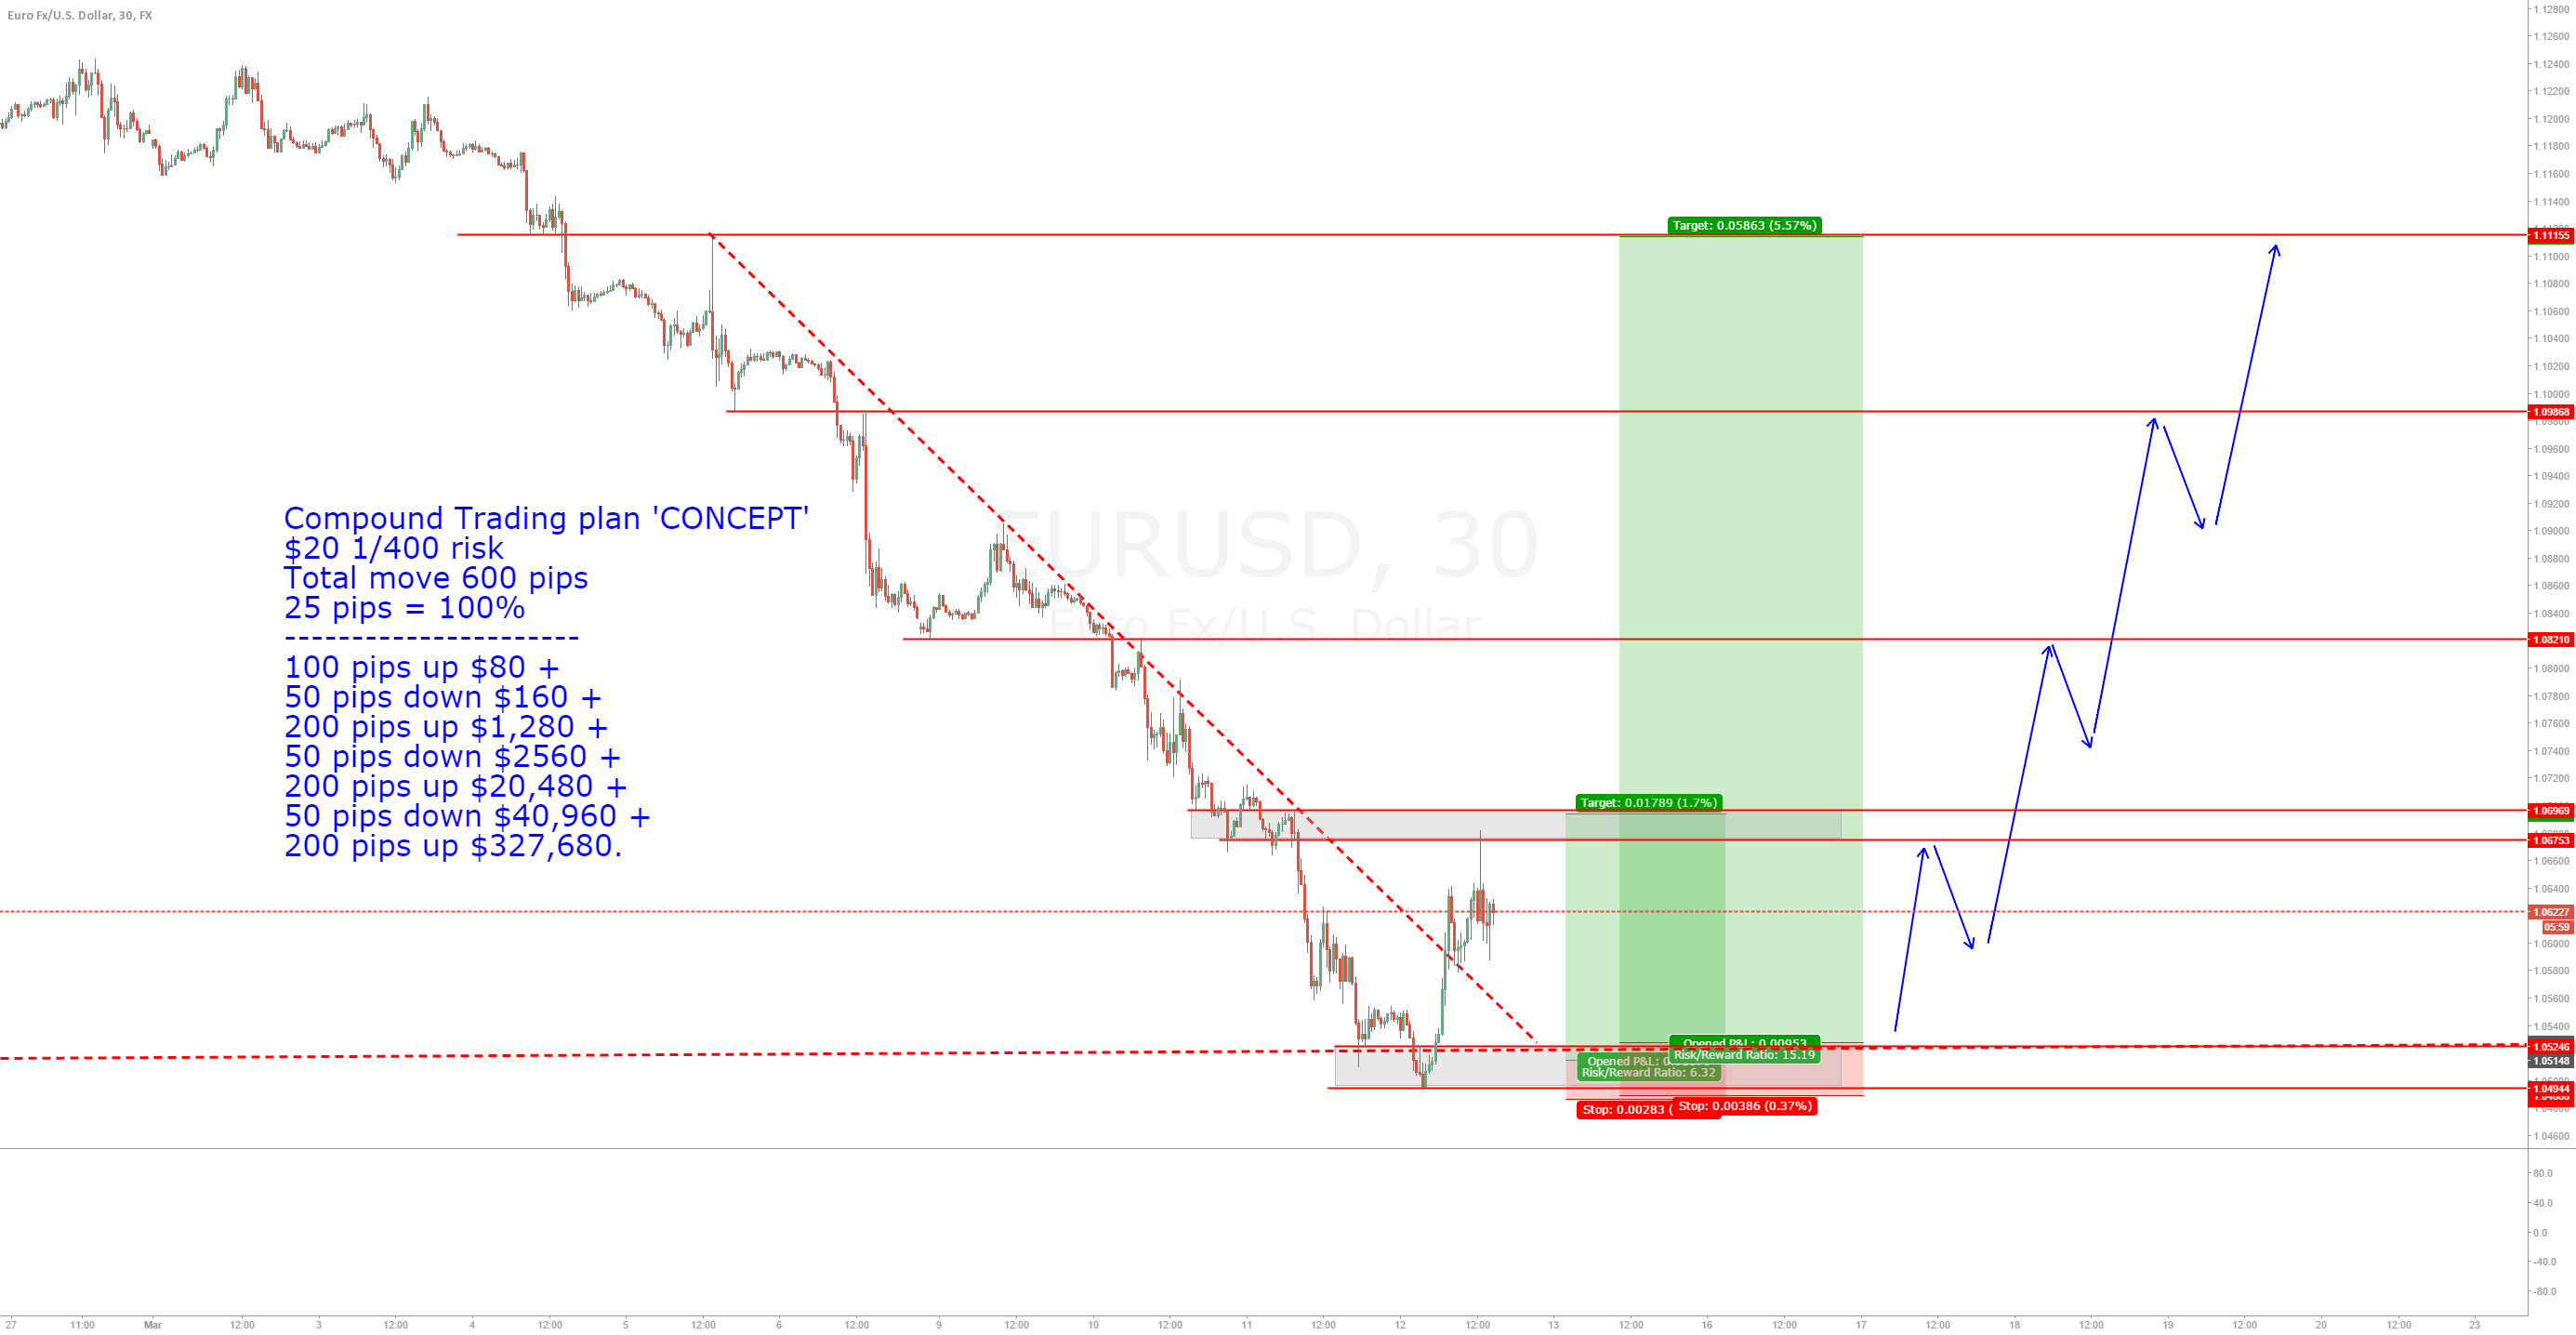 $20 - $327,680 /  7 Trades /  1 MONTH / Trading plan.